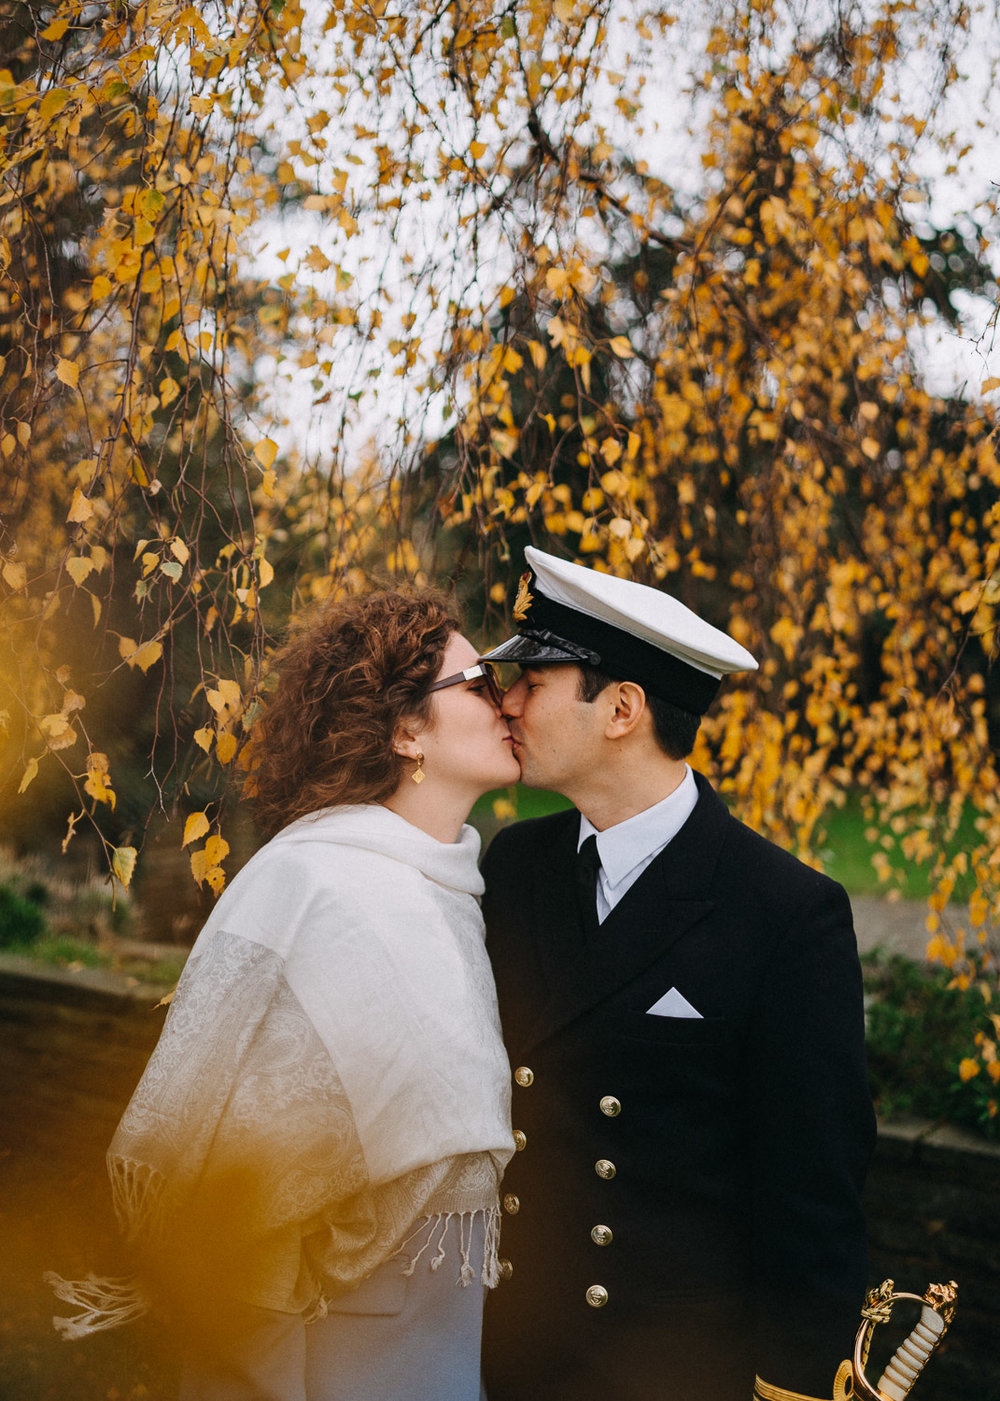 Natural and Romantic London Wedding Photographer